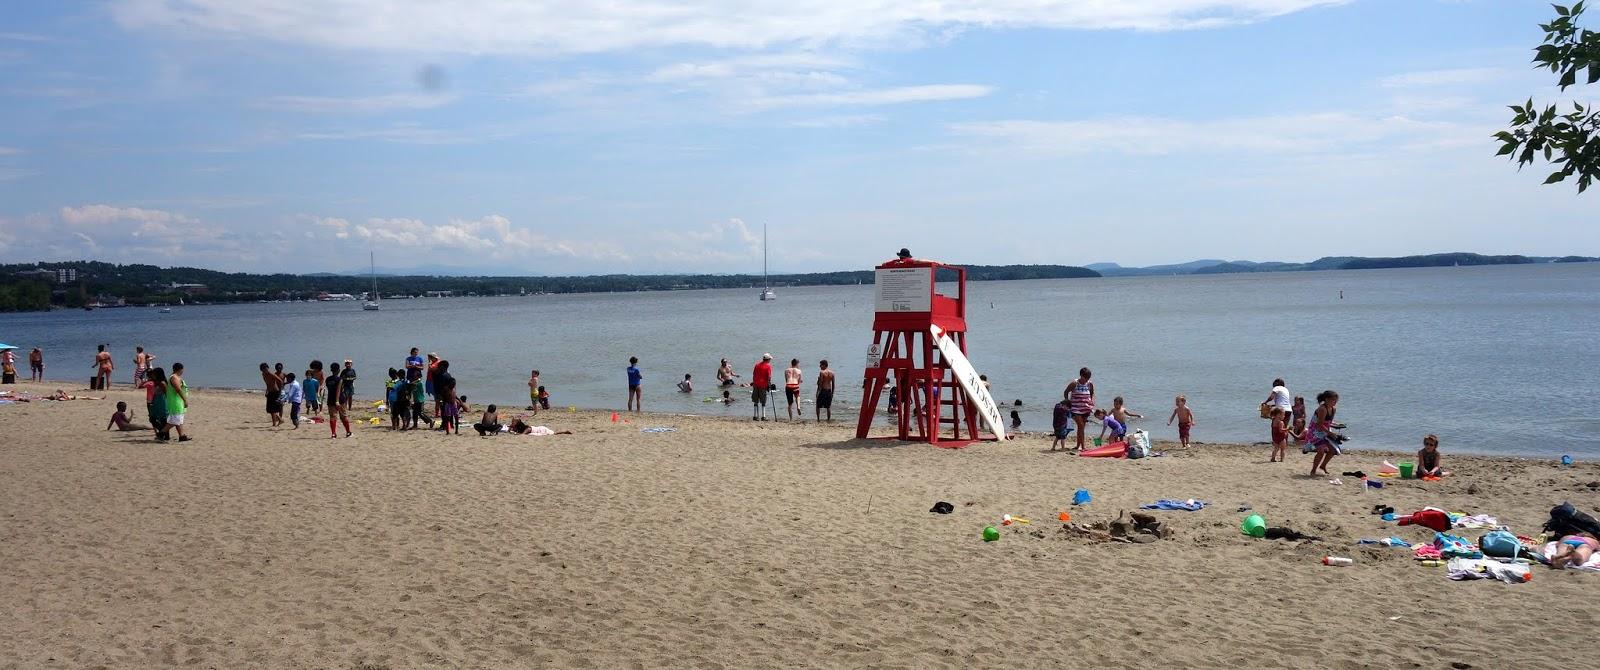 Very Nice Sandy Beach Located On The Ss Of Lake Champlain